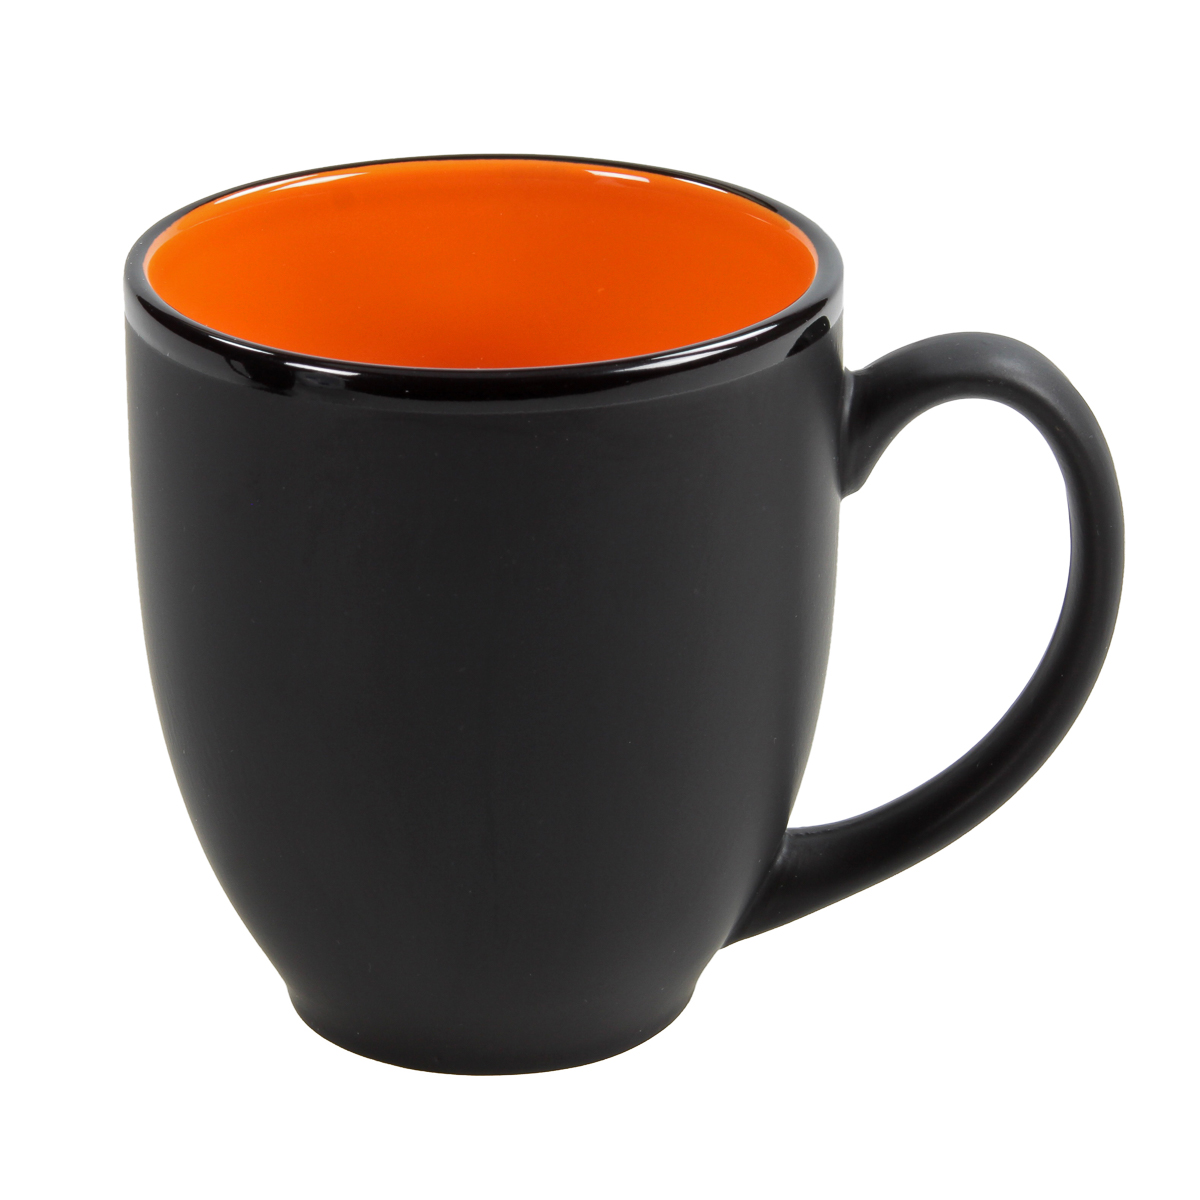 Hilo Bistro Coffee Ceramic Mug Orange Matte Black Cafe